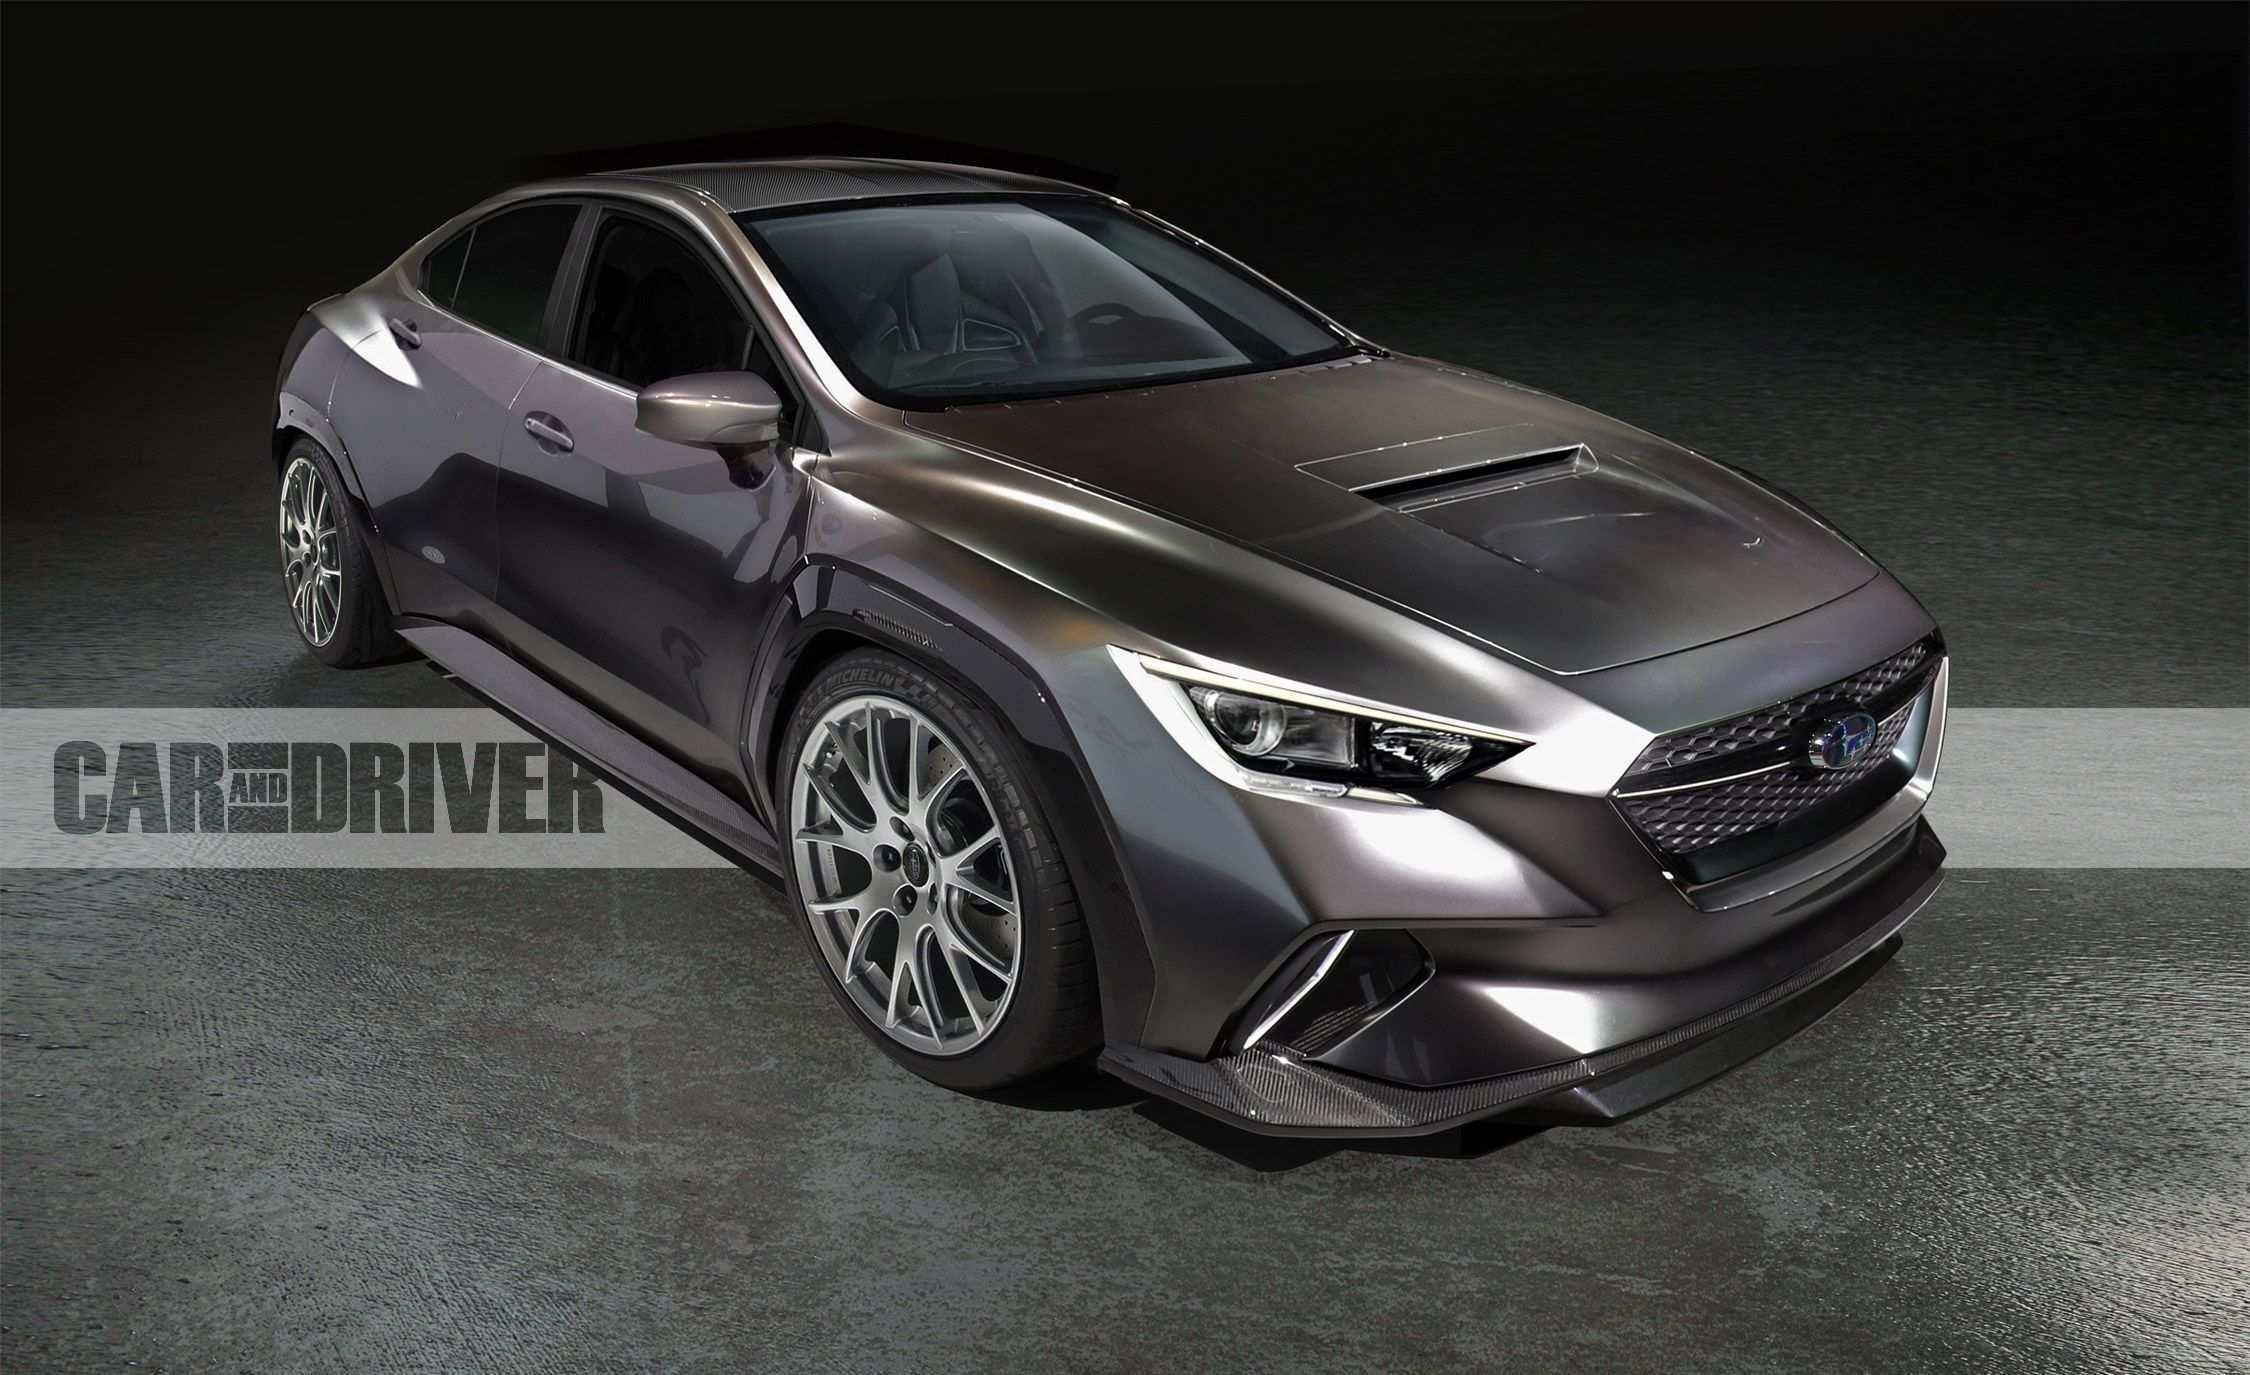 69 Concept of 2020 Subaru Lineup Exterior and Interior with 2020 Subaru Lineup